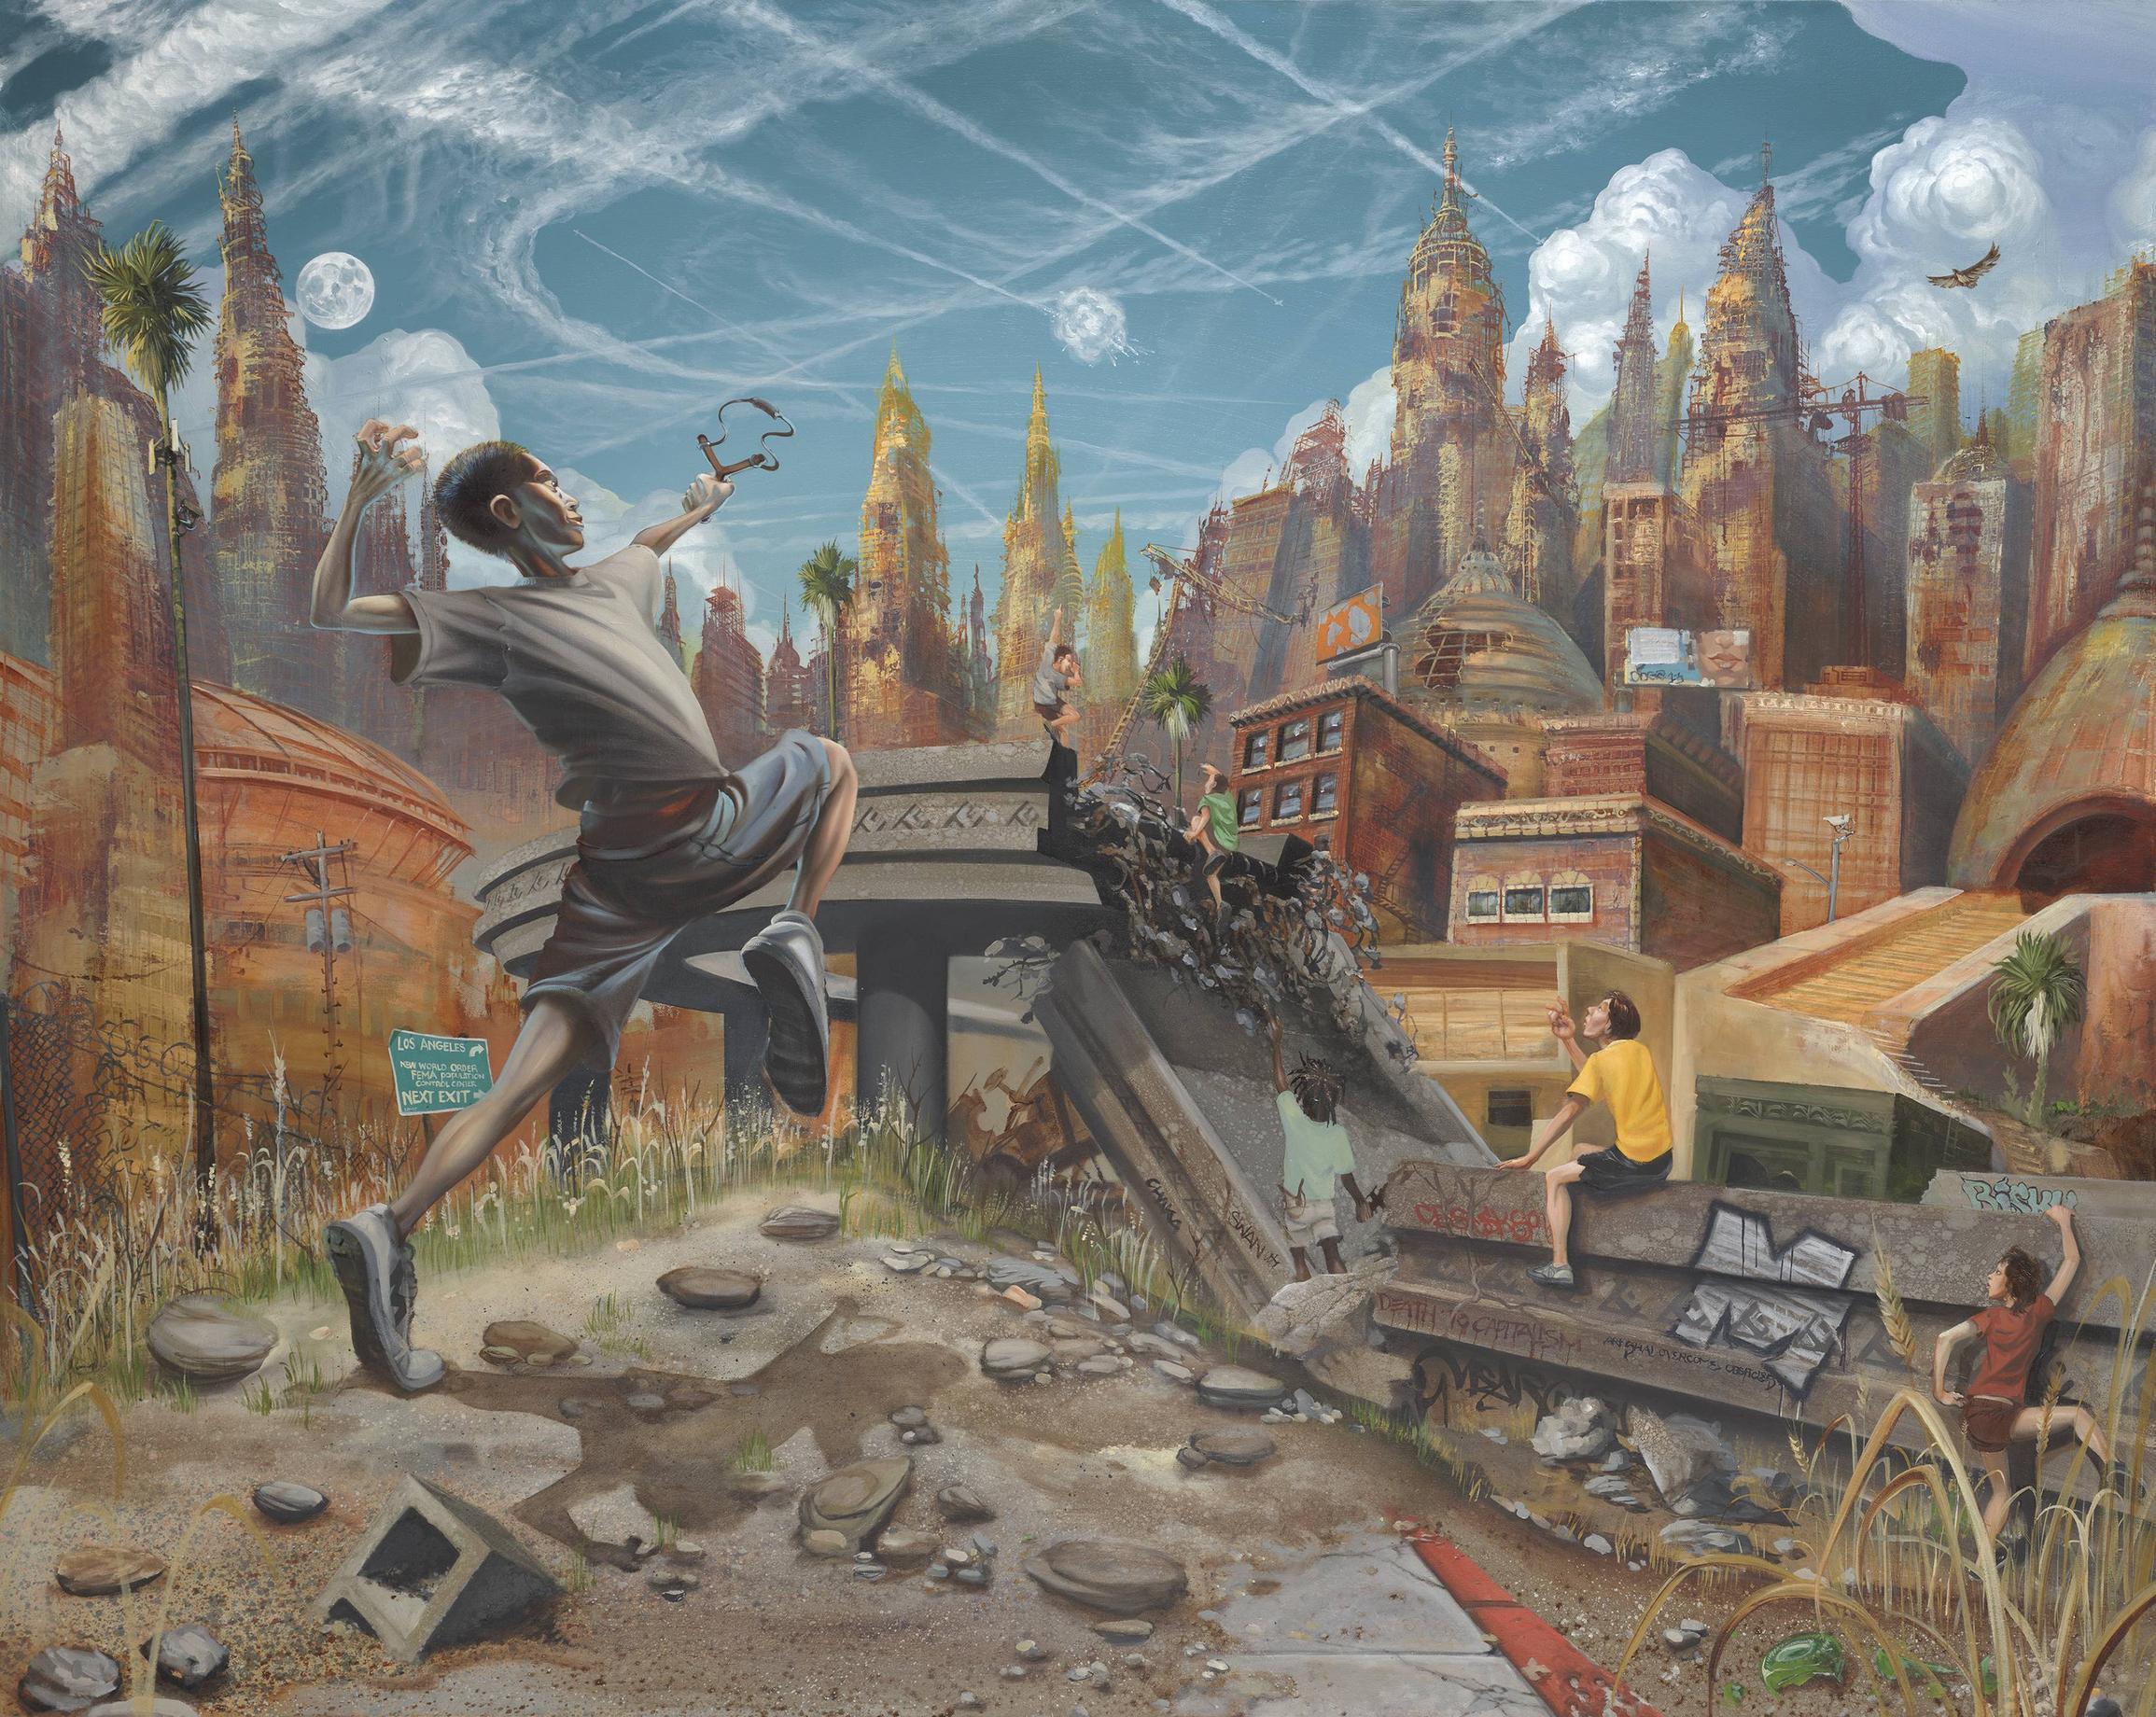 Freeport - David & Goliath 38/100